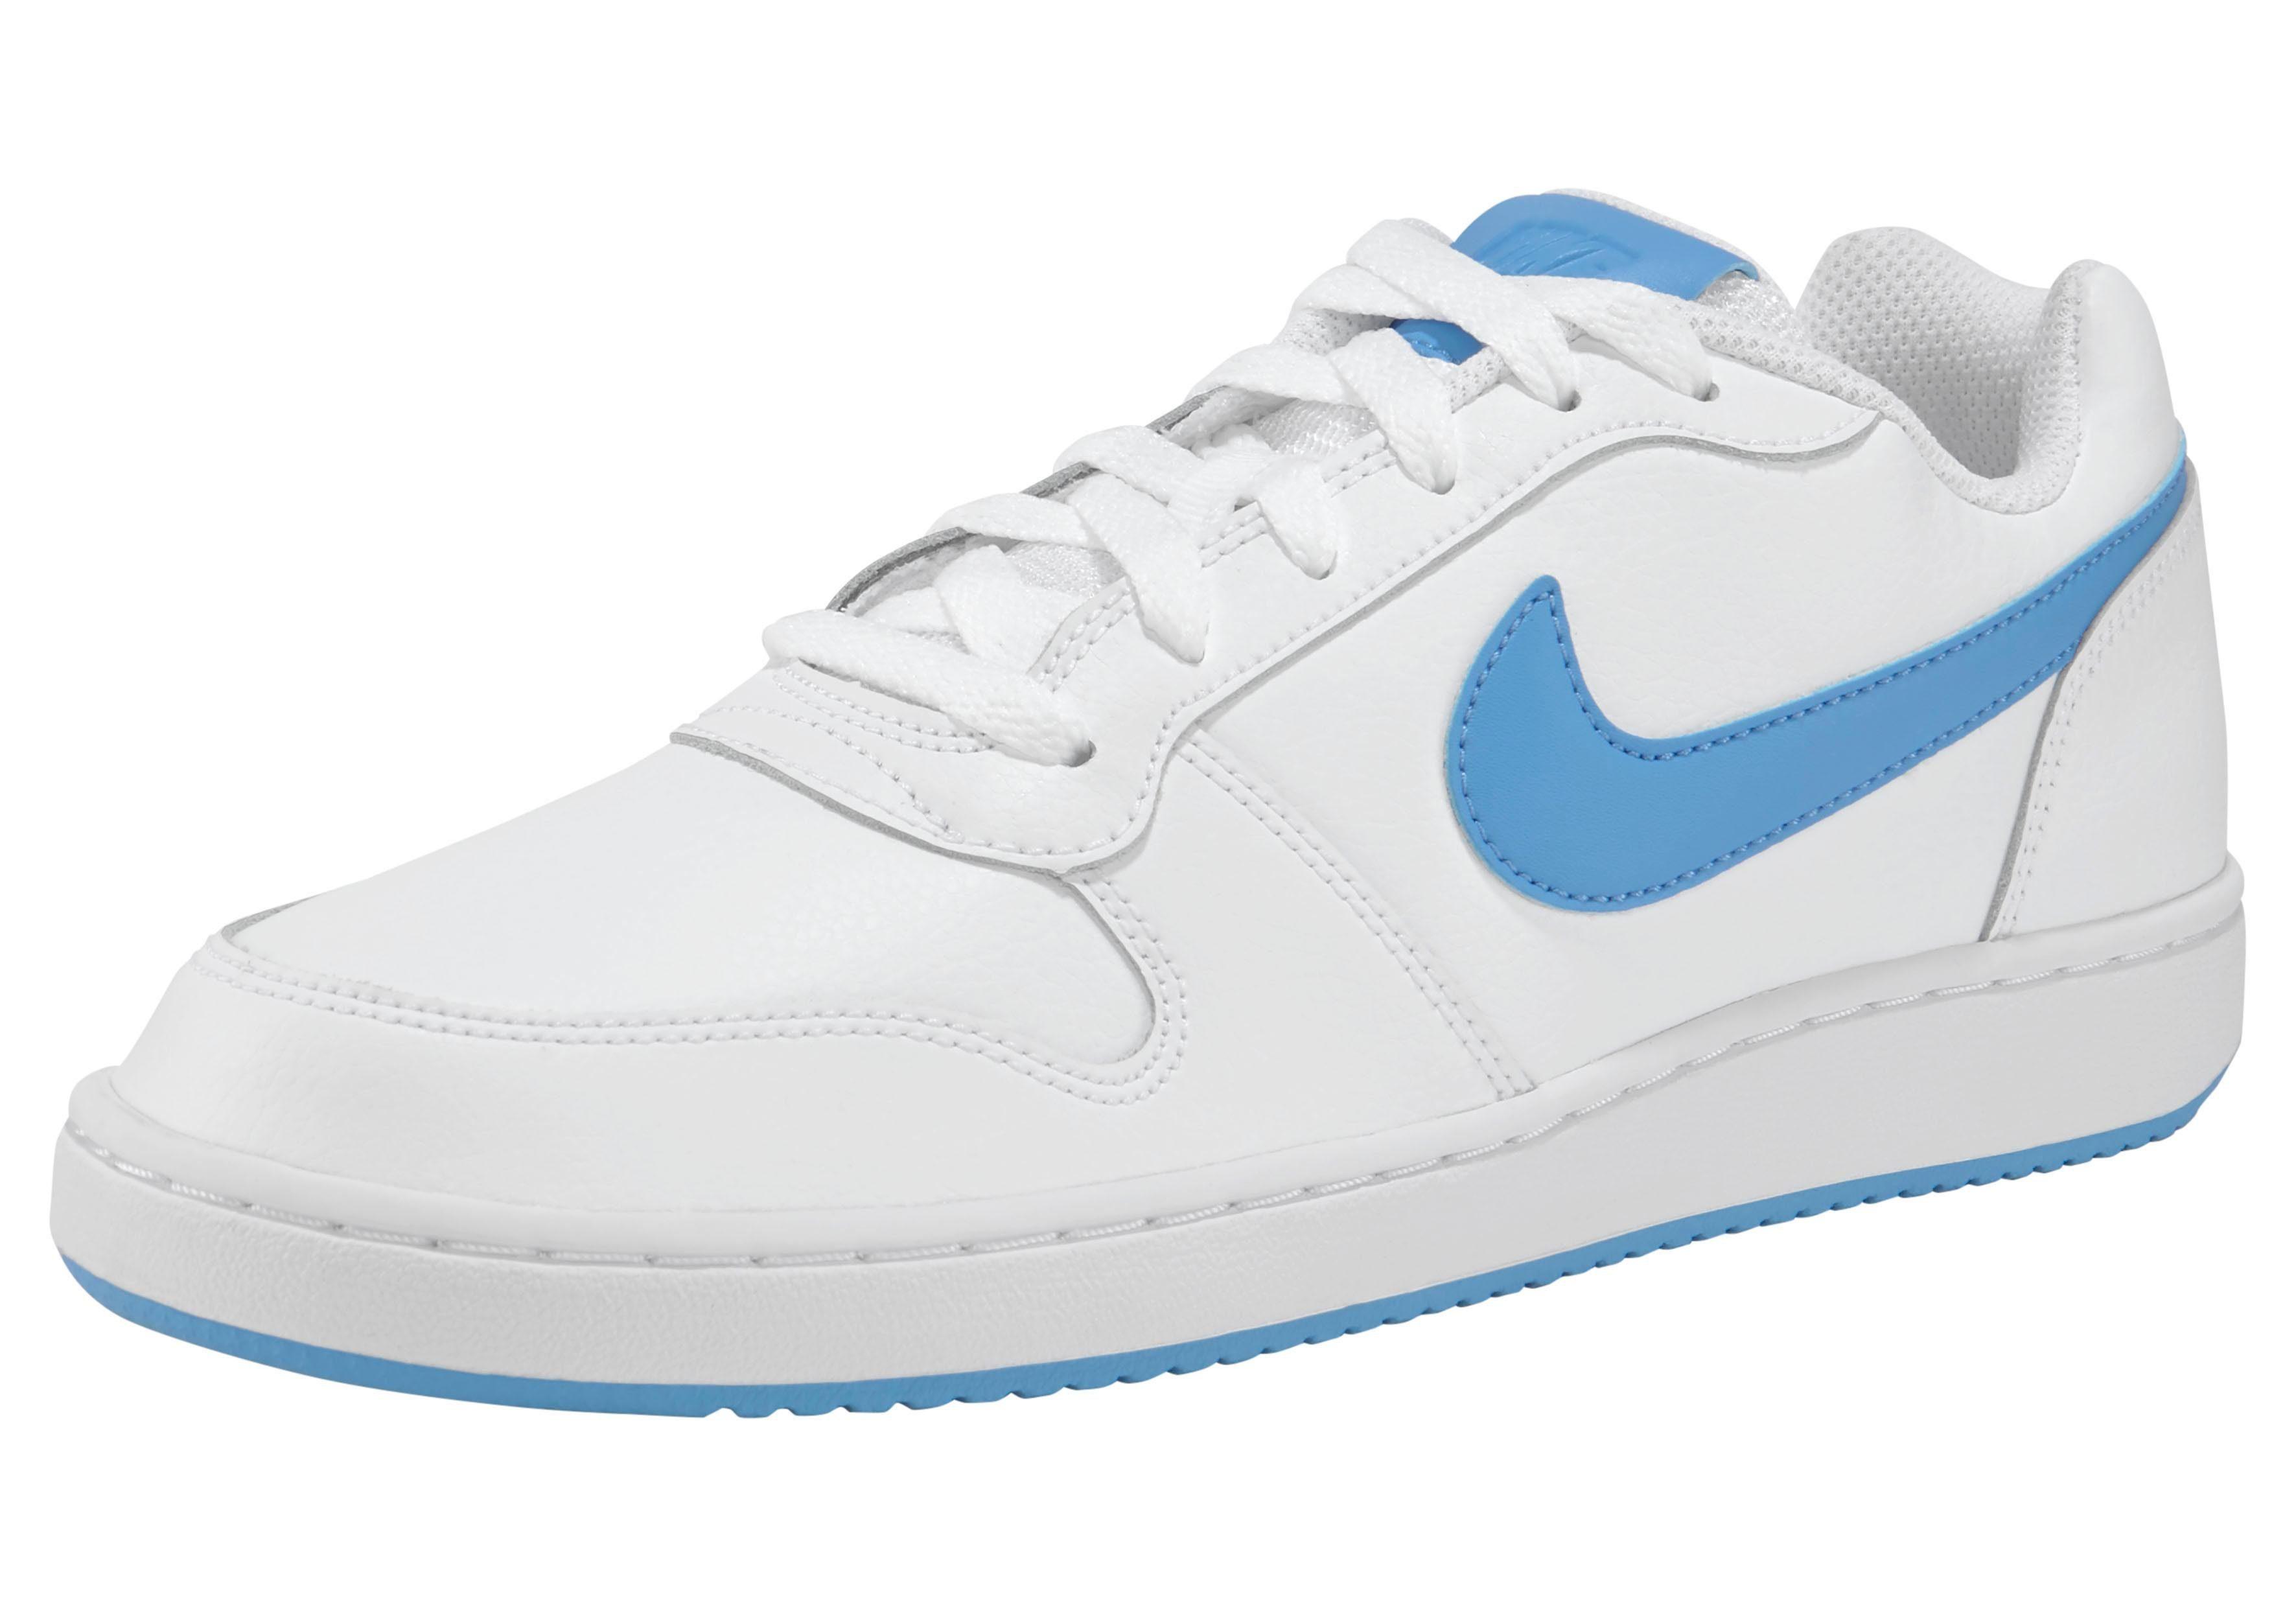 Nike Sportswear »Ebernon Low« Sneaker kaufen | OTTO